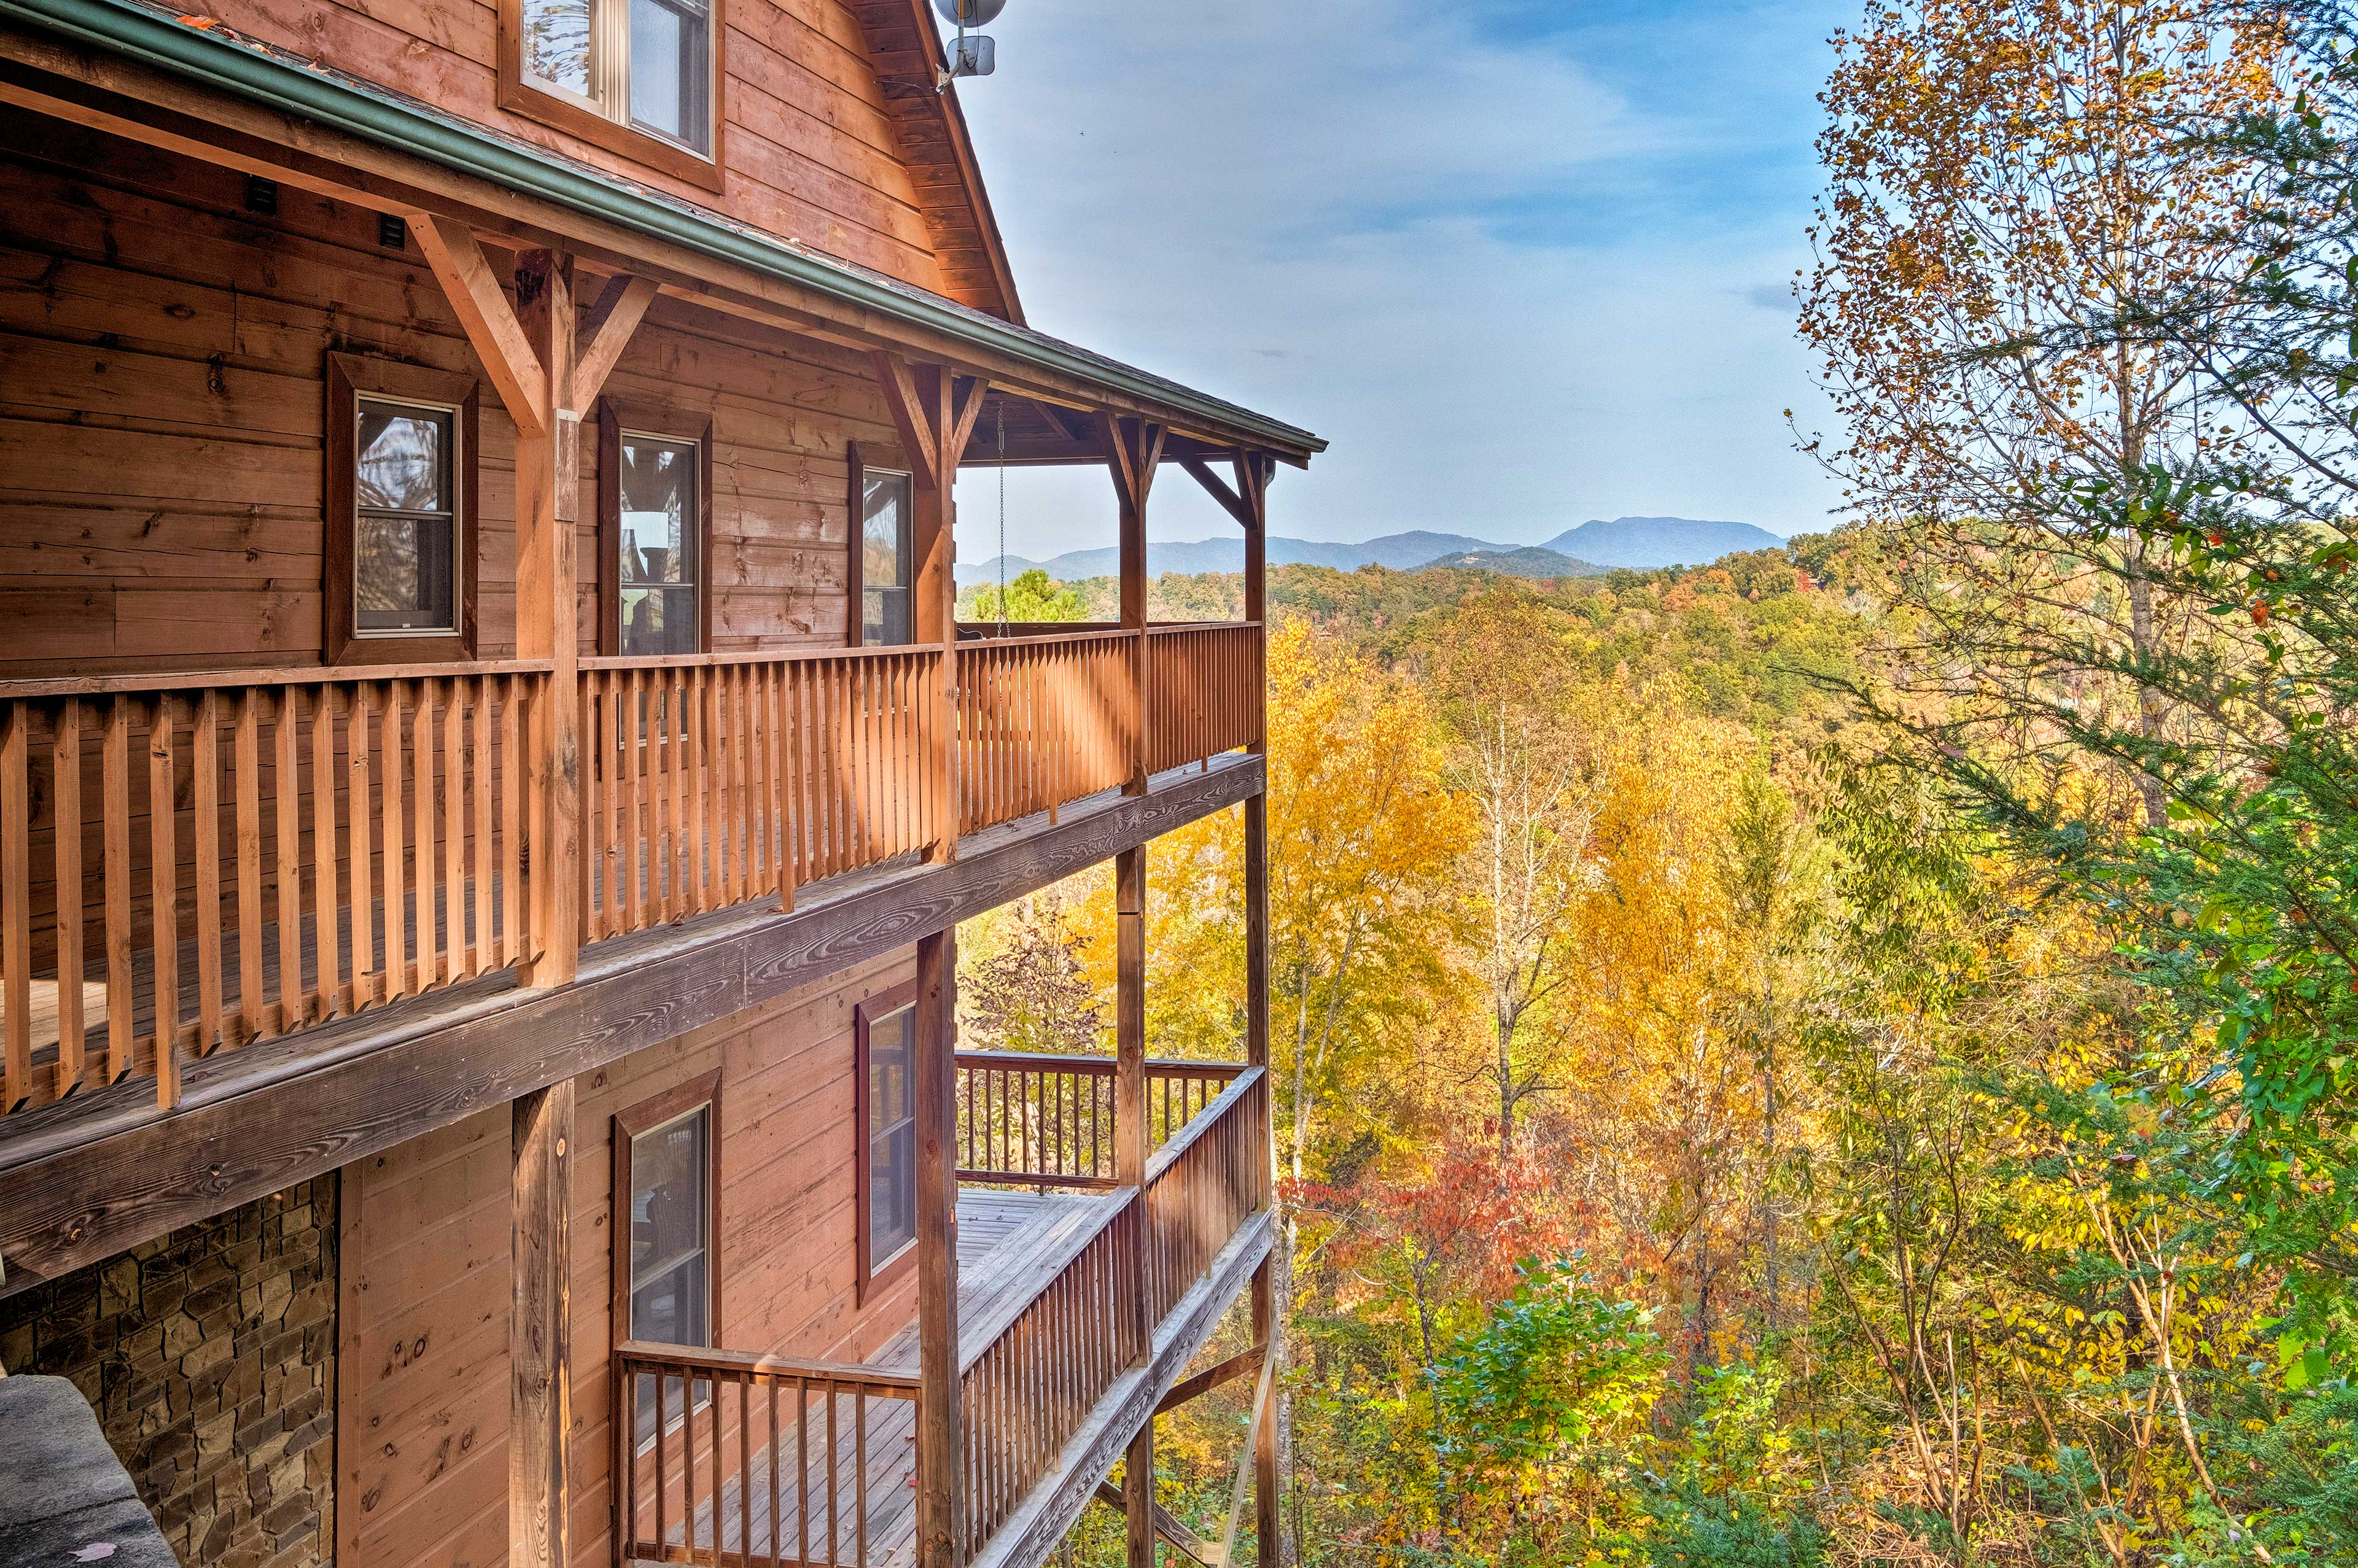 Relish the Smoky Mountain views from the wraparound deck.